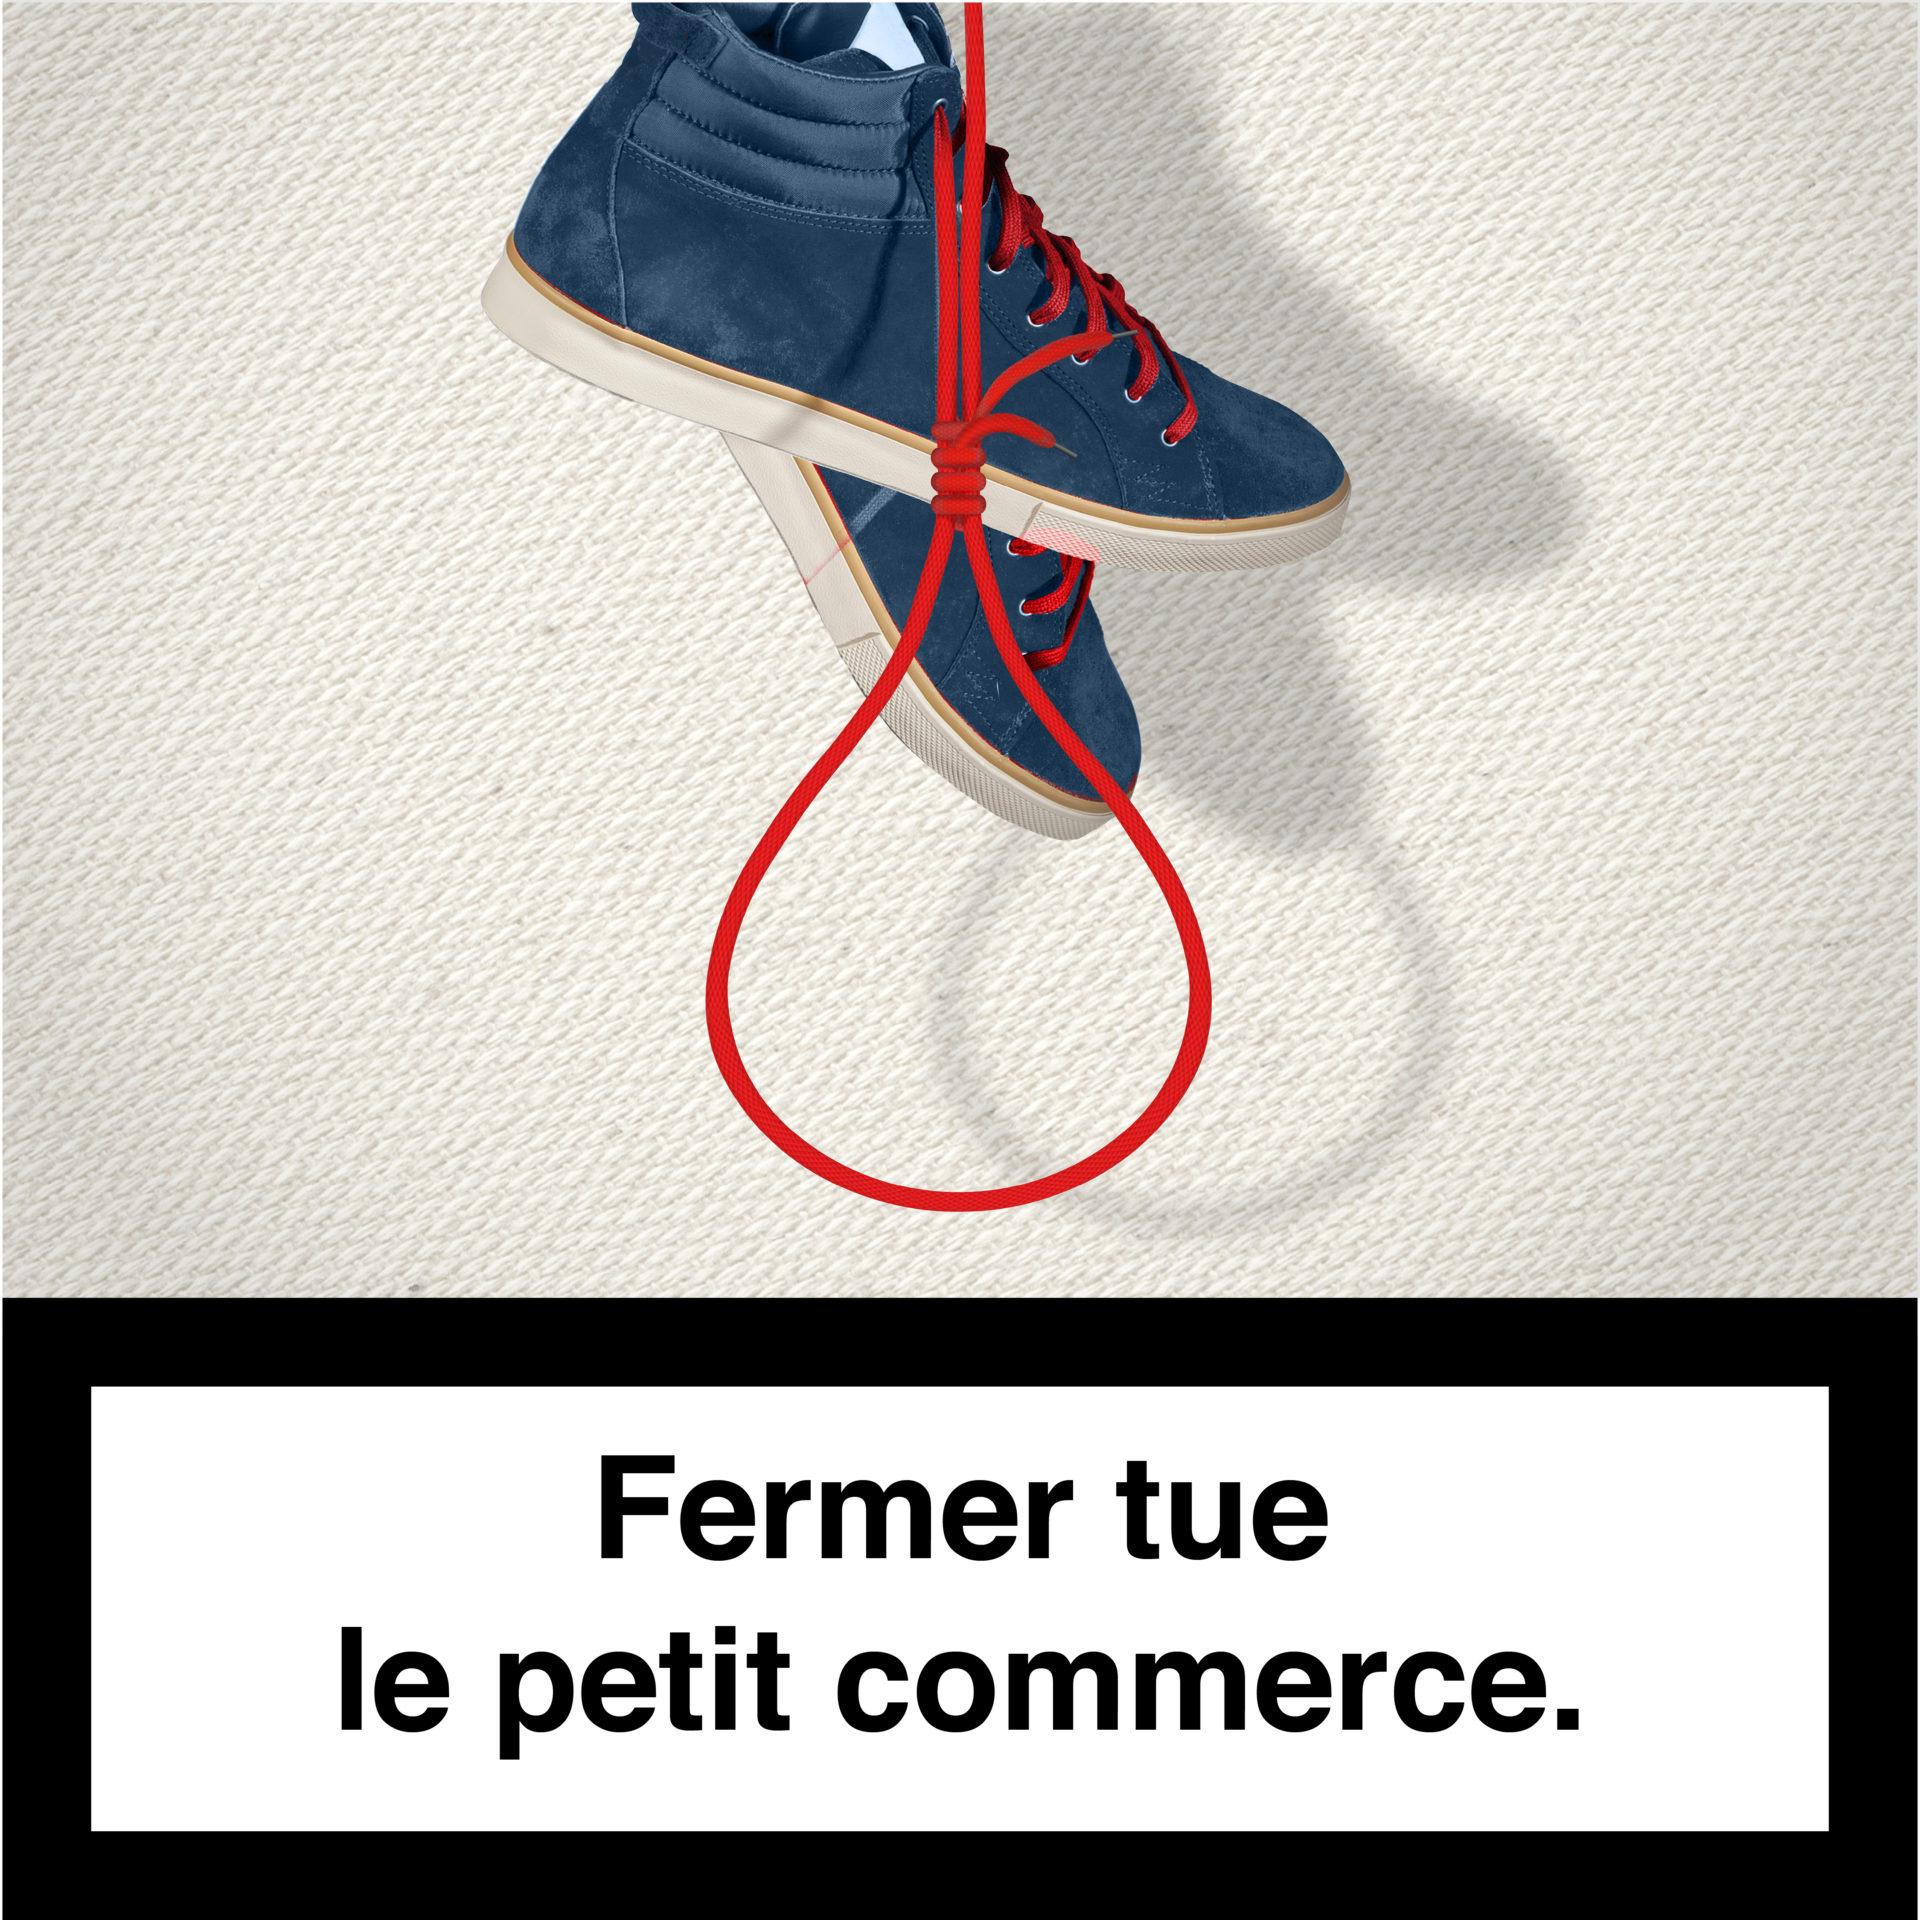 CDFC – FERMER TUE